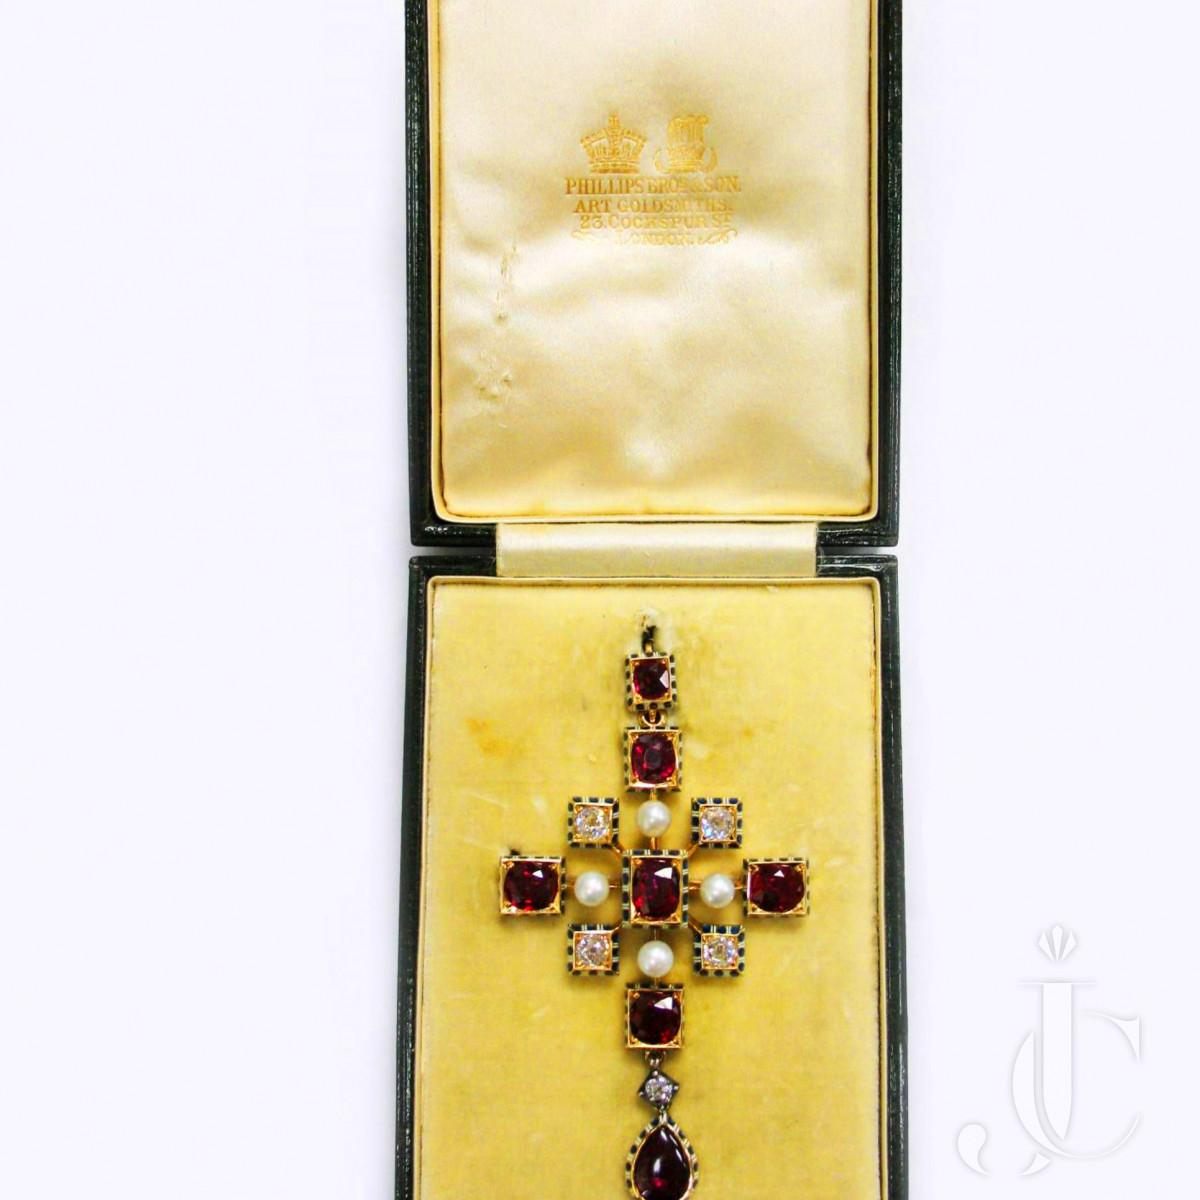 Antique Cross by Robert Philips, circa 1880